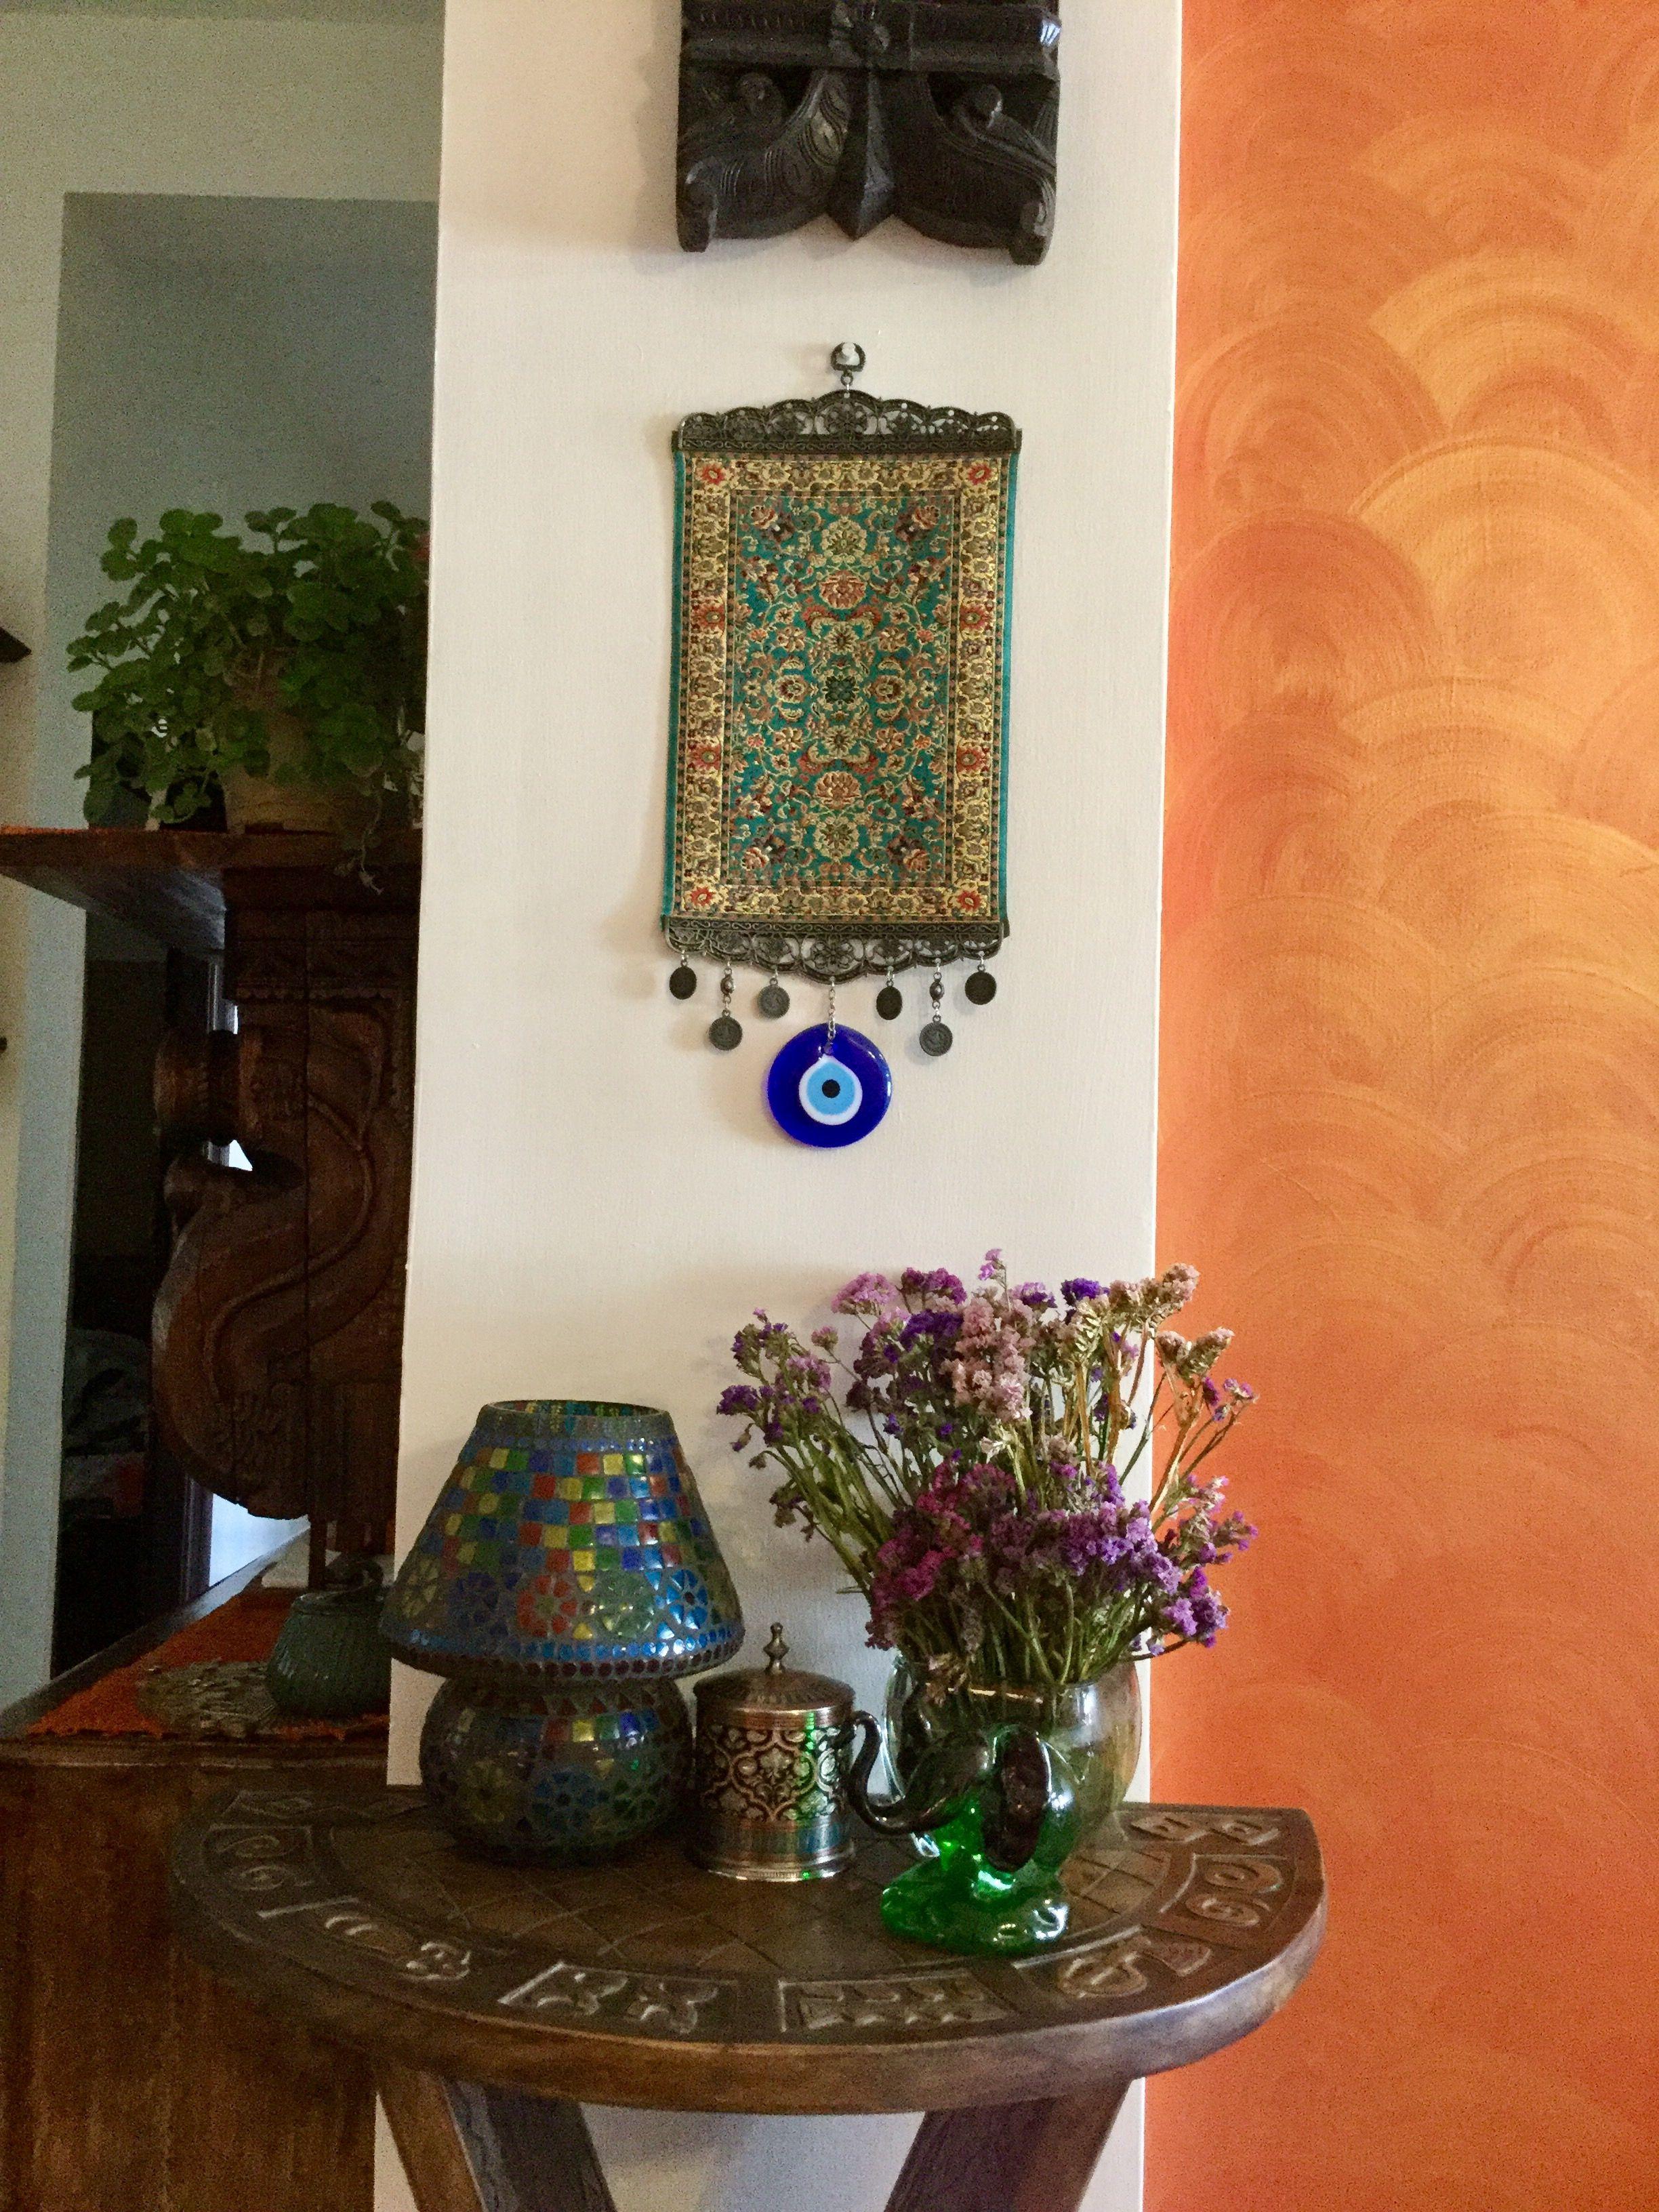 Pin by kamalinipatra on corners | Indian home decor ...